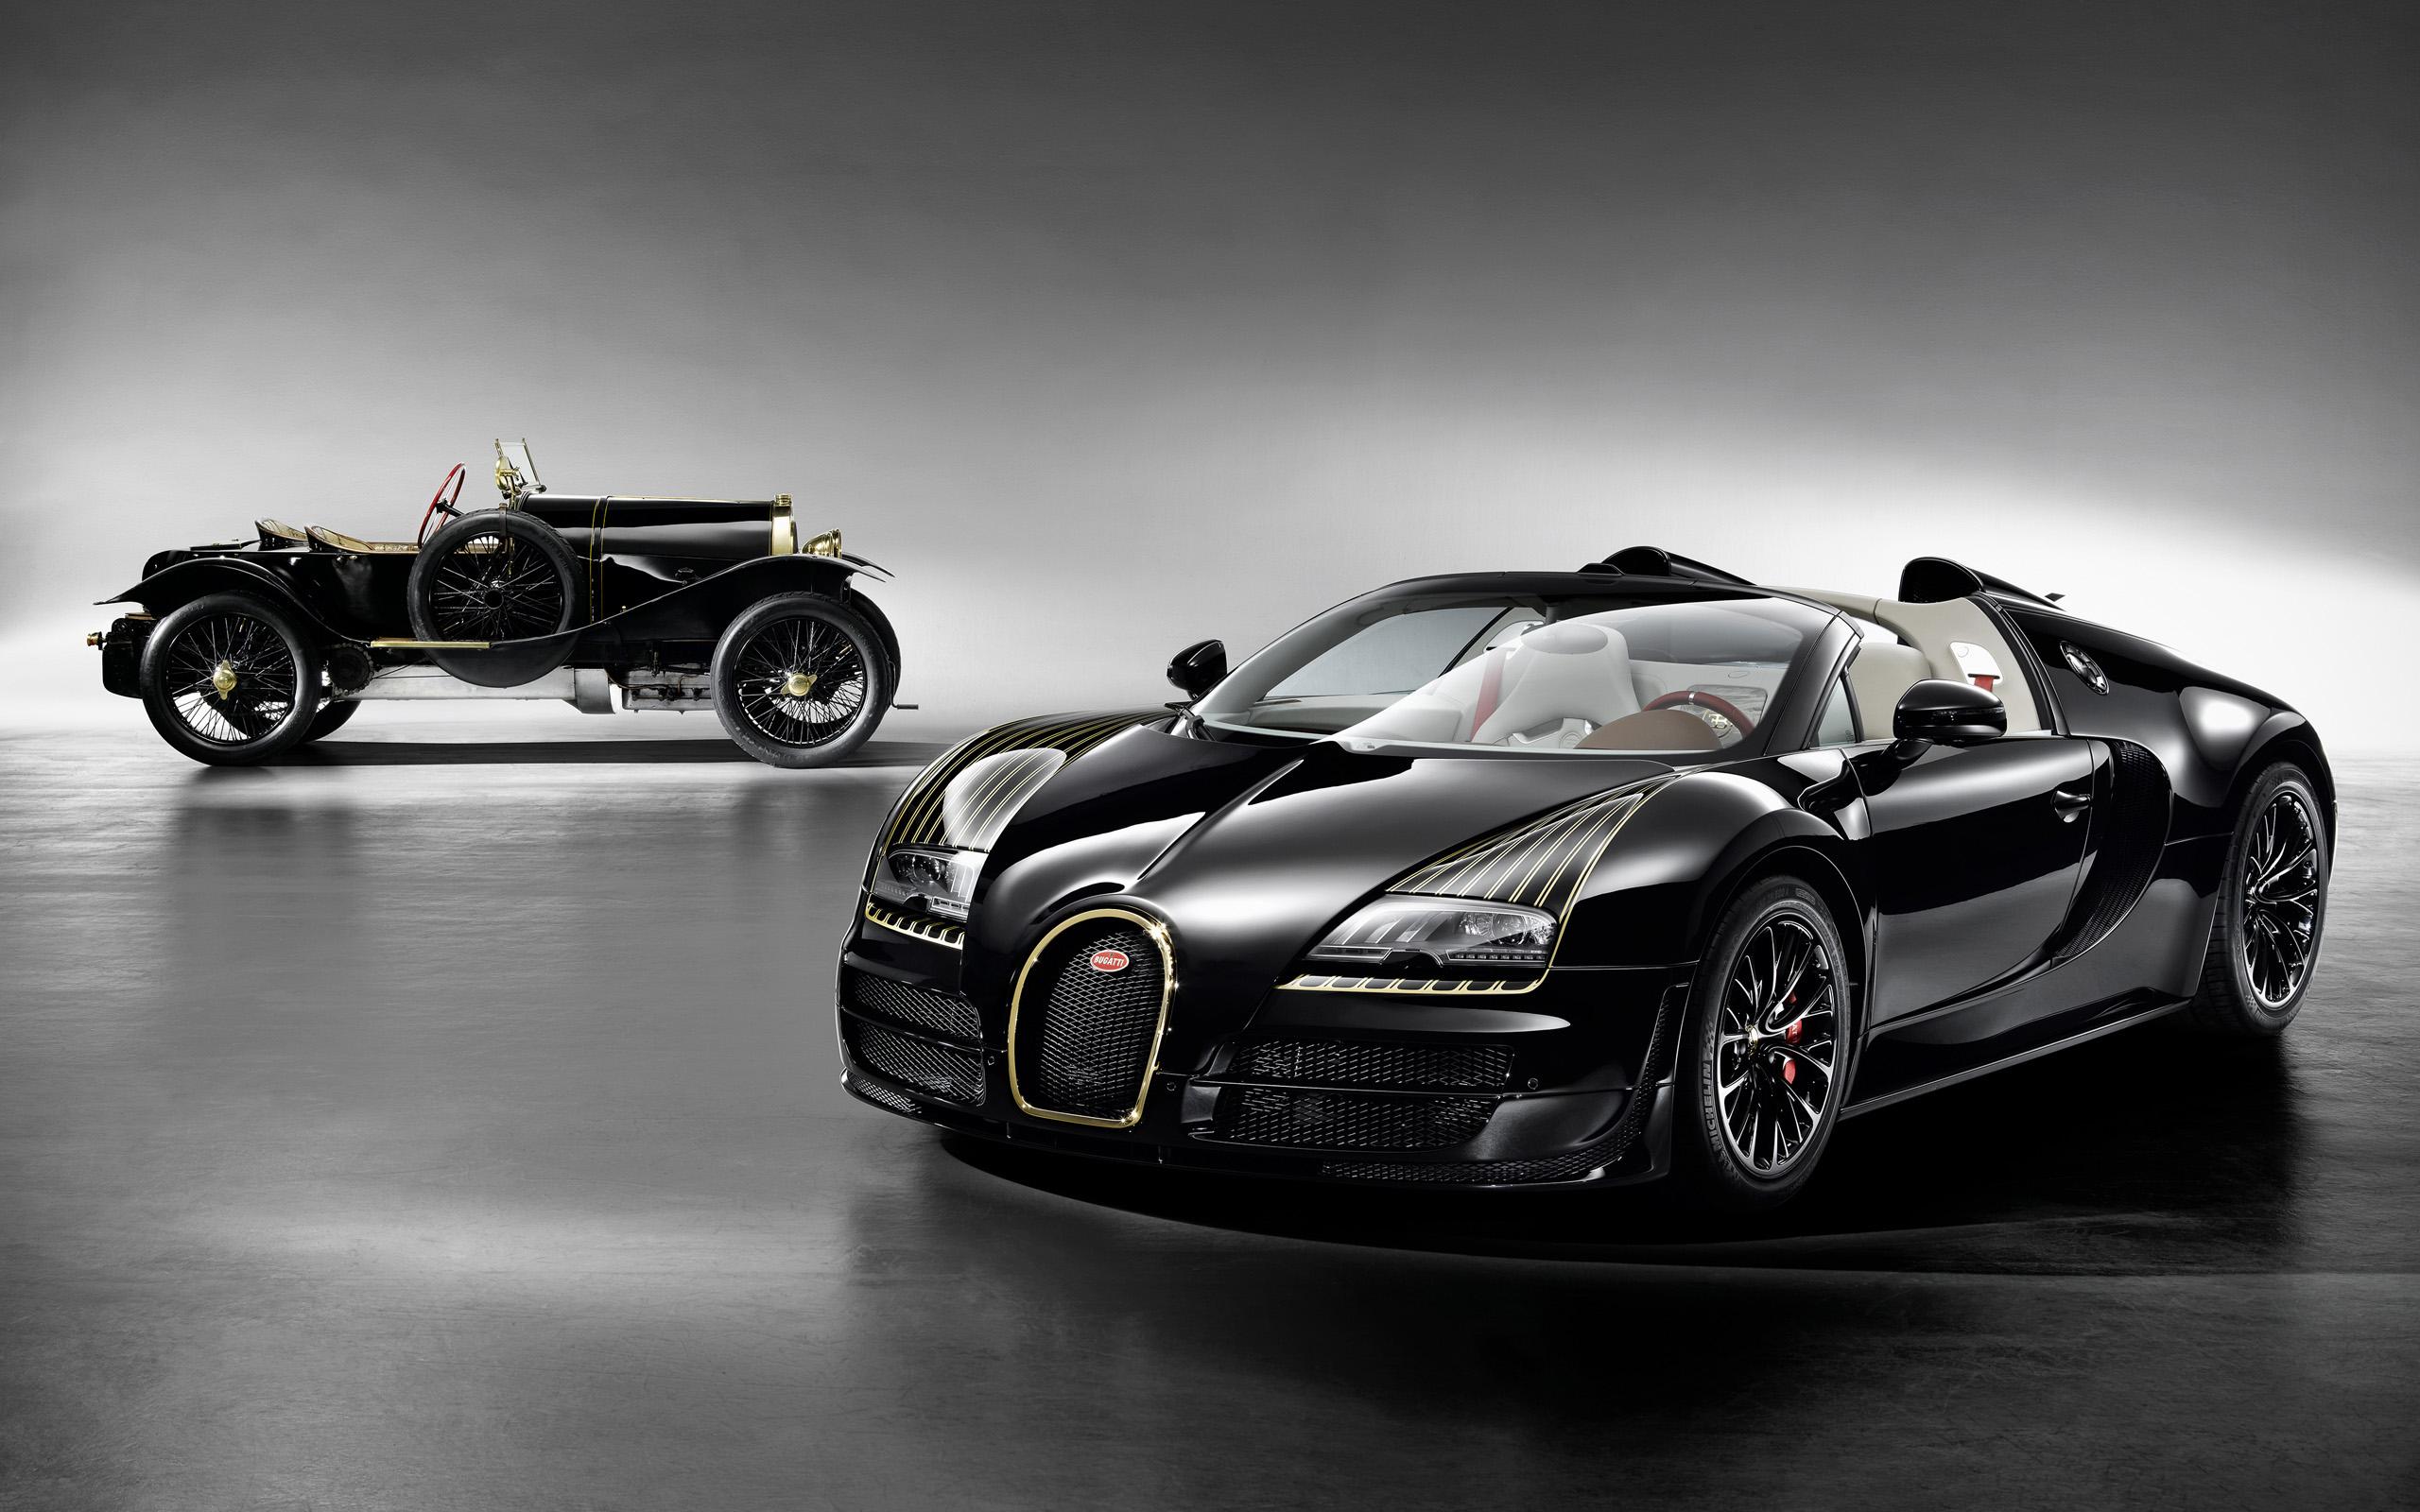 2014 bugatti veyron grand sport vitesse legend black bess. Black Bedroom Furniture Sets. Home Design Ideas